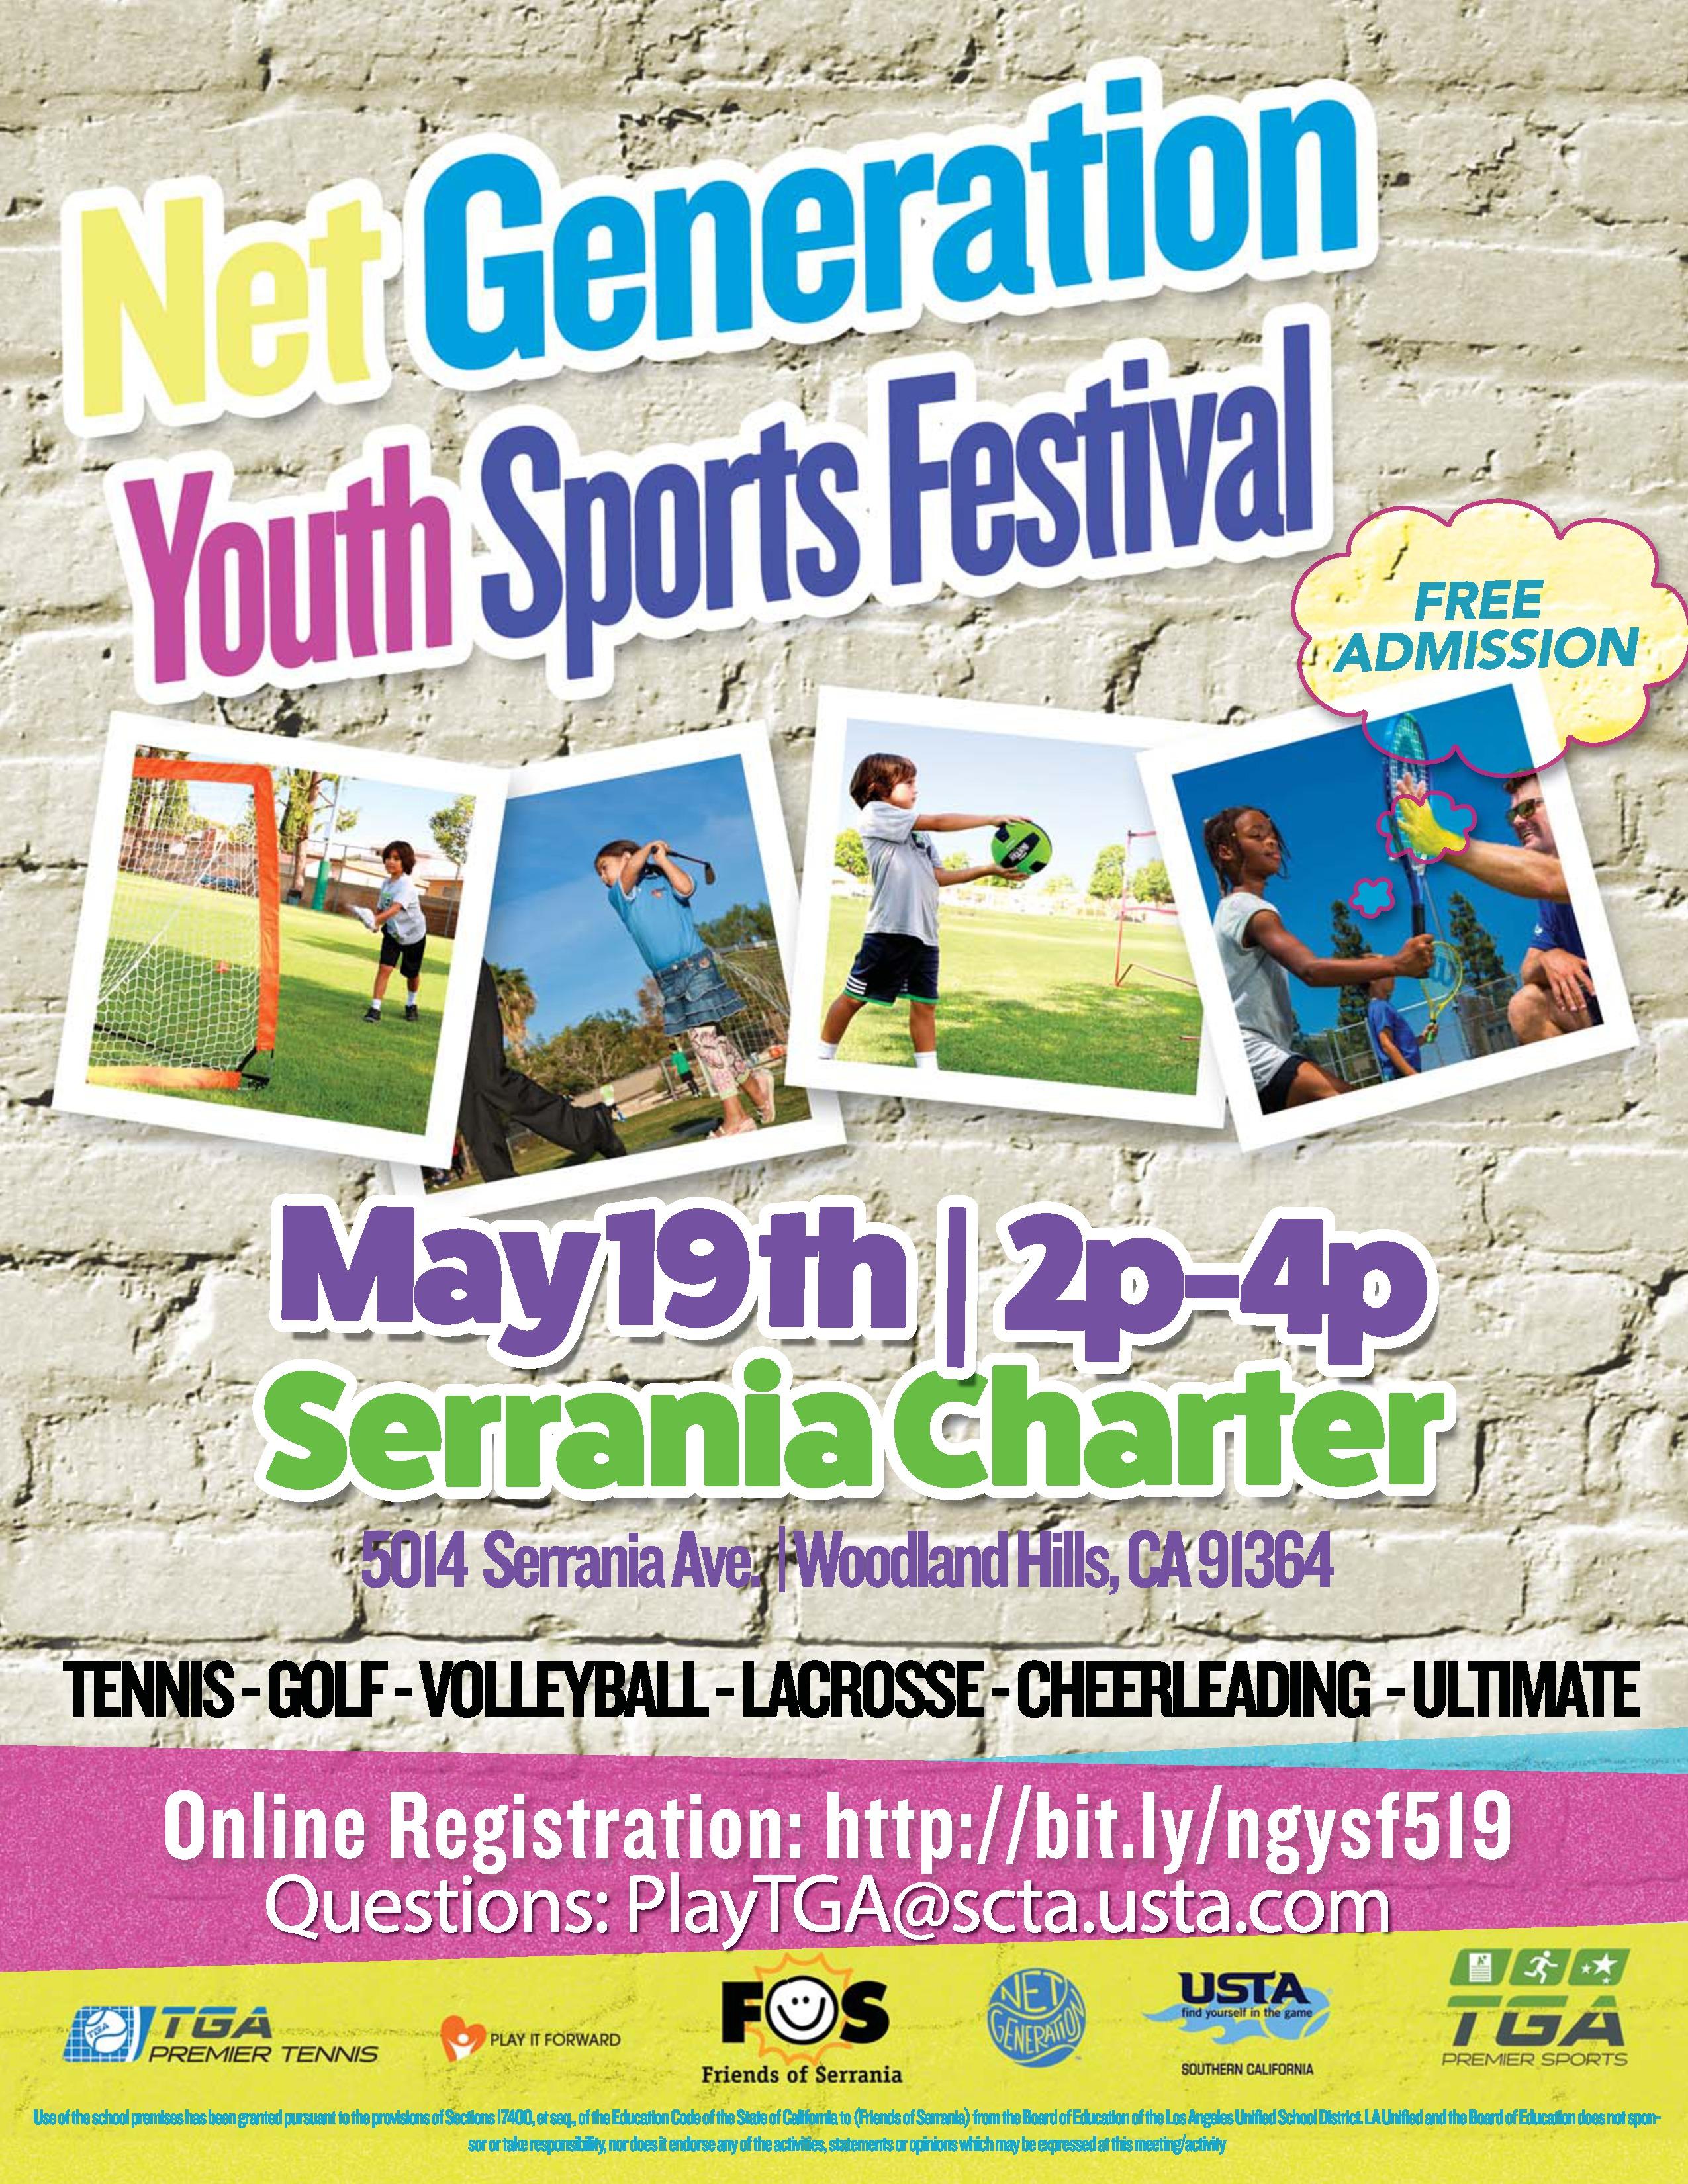 Serrania-USTA-TGA_Youth_Sports_Fest-page-0.jpg